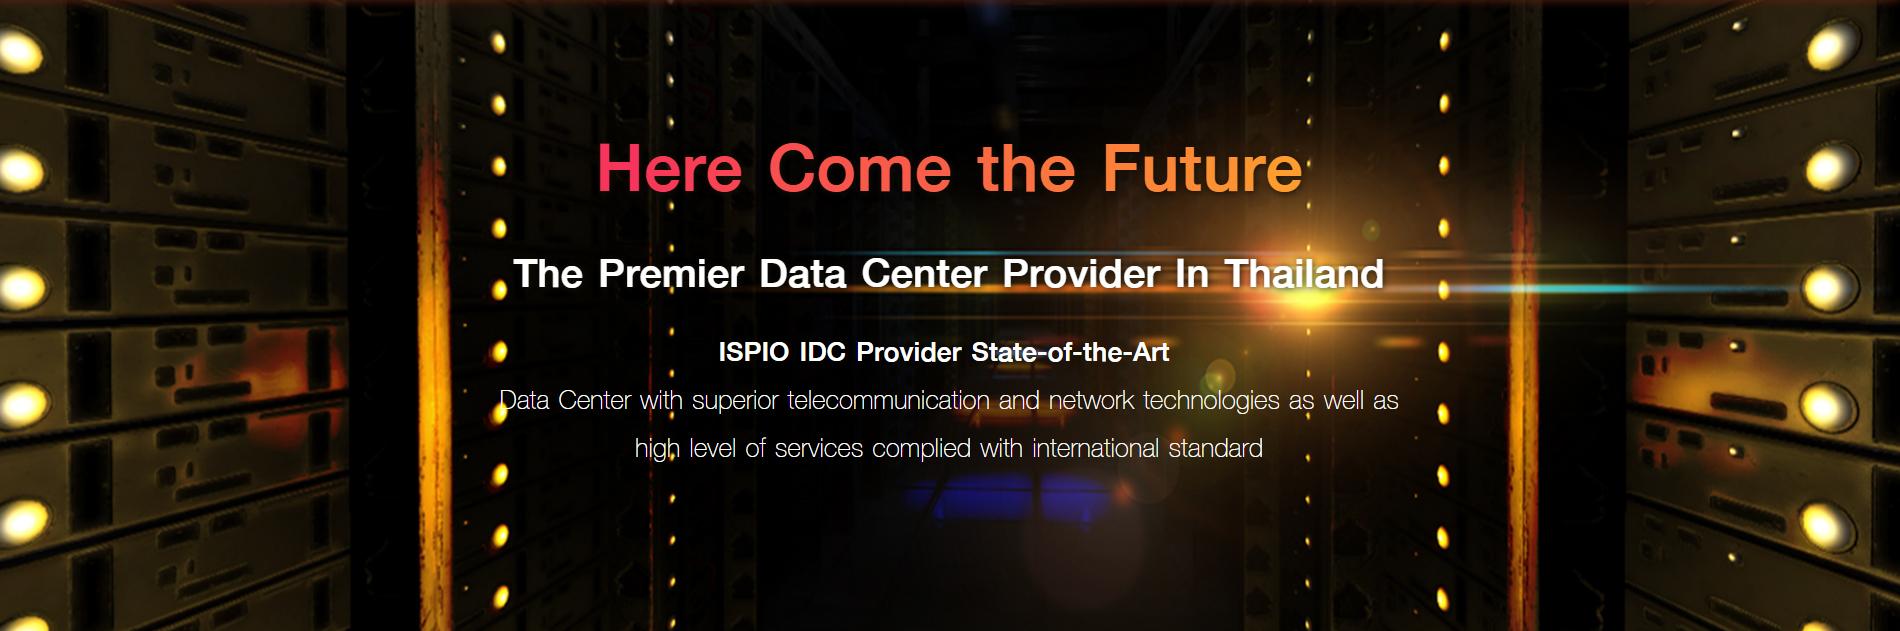 Data Center Provider In Thailand